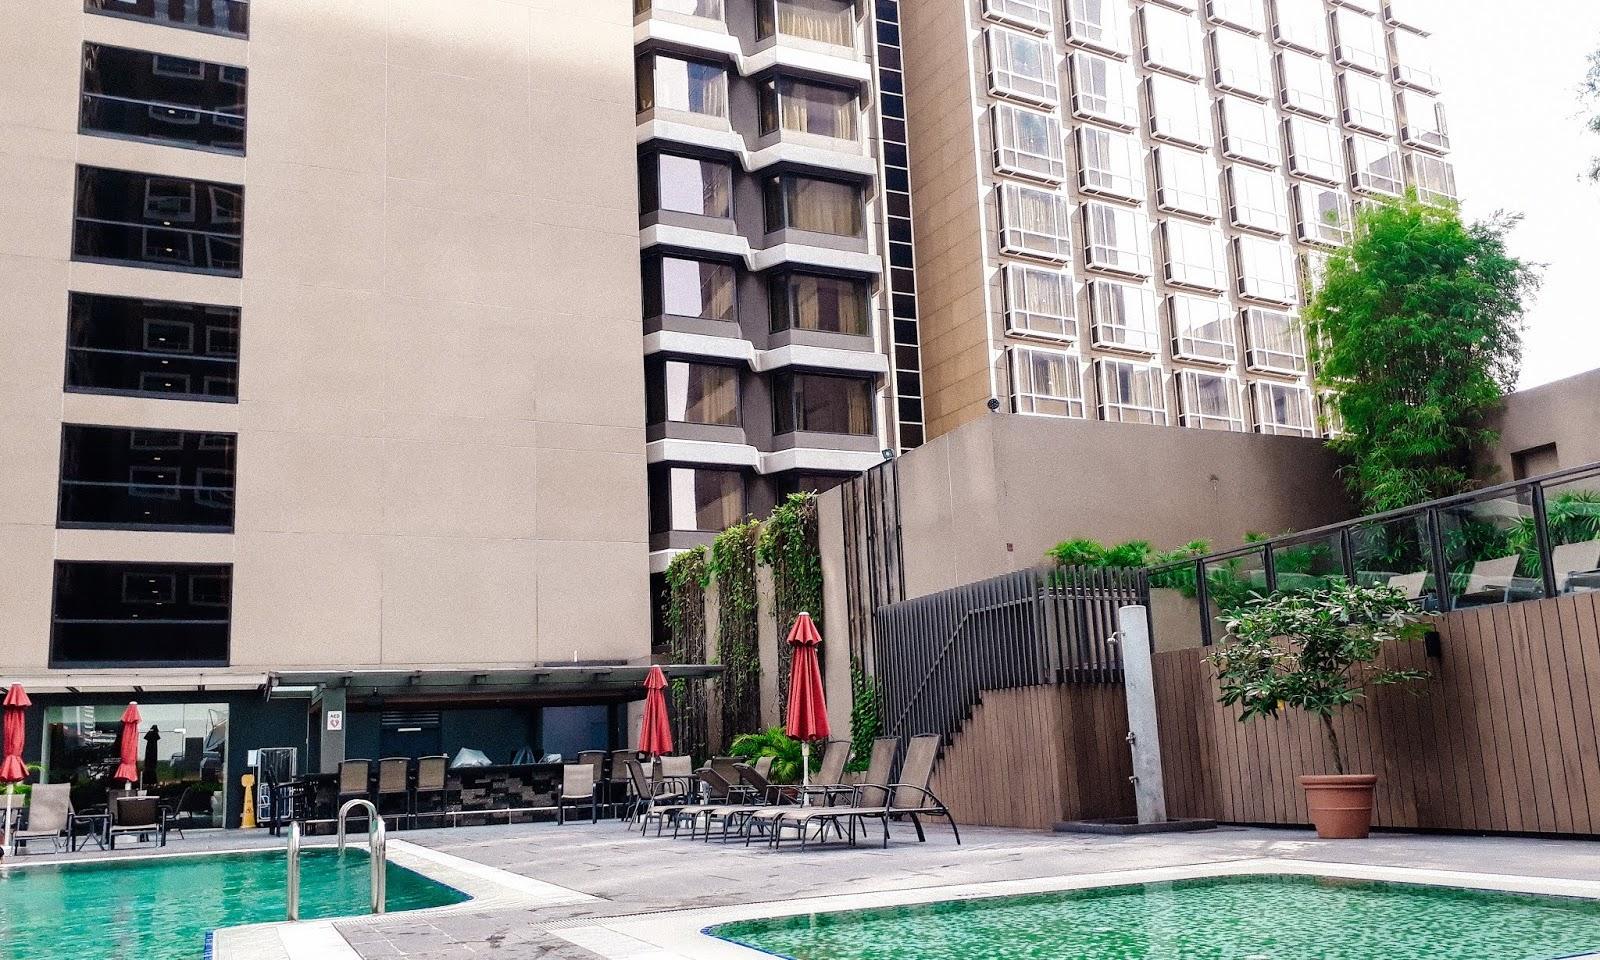 carlton hotel singapore review